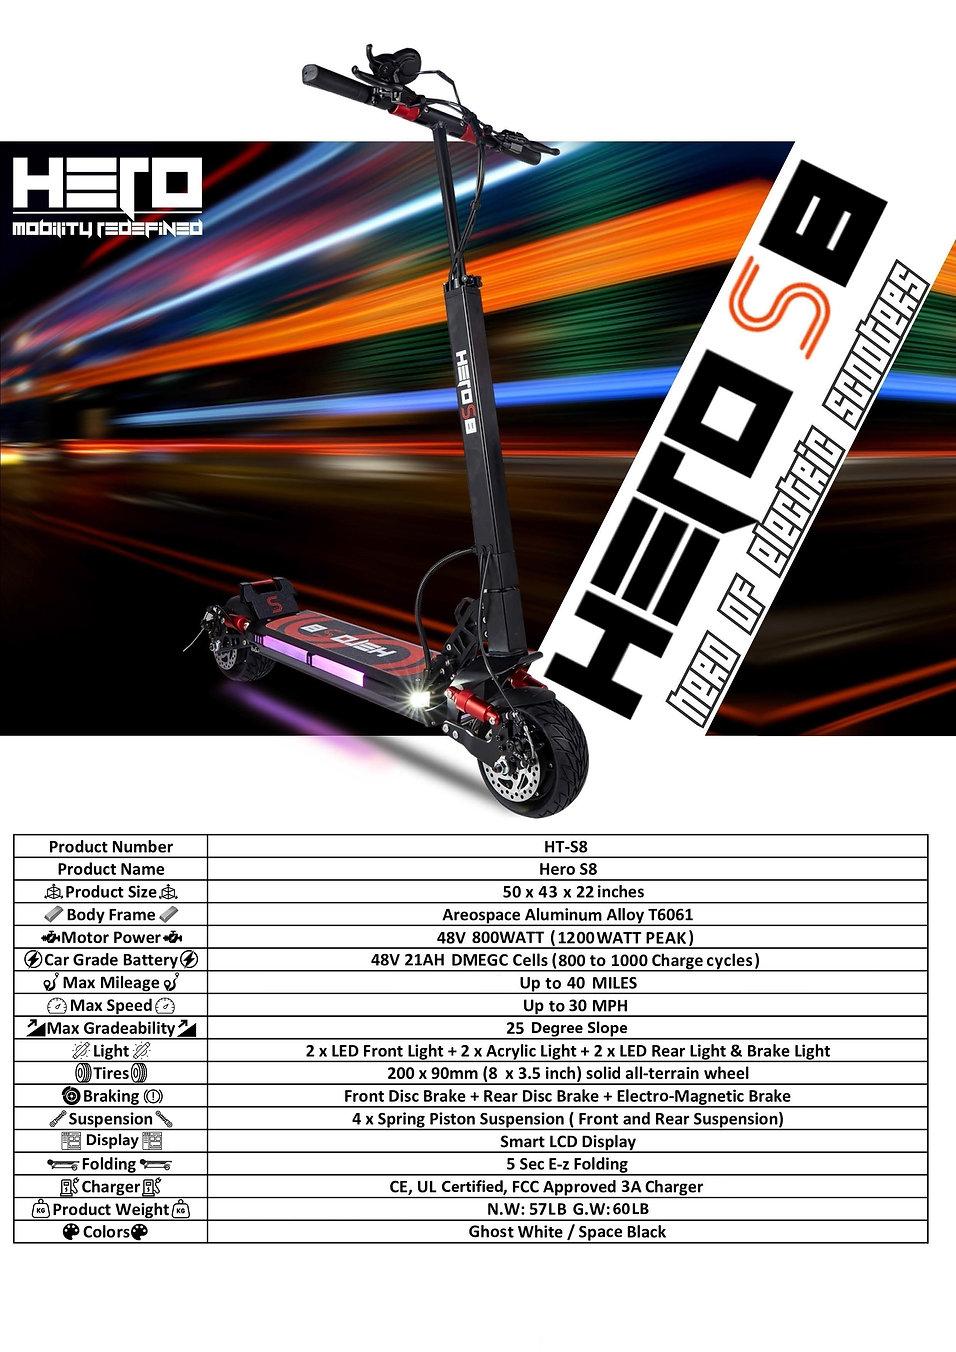 Hero S8 scooter Specs